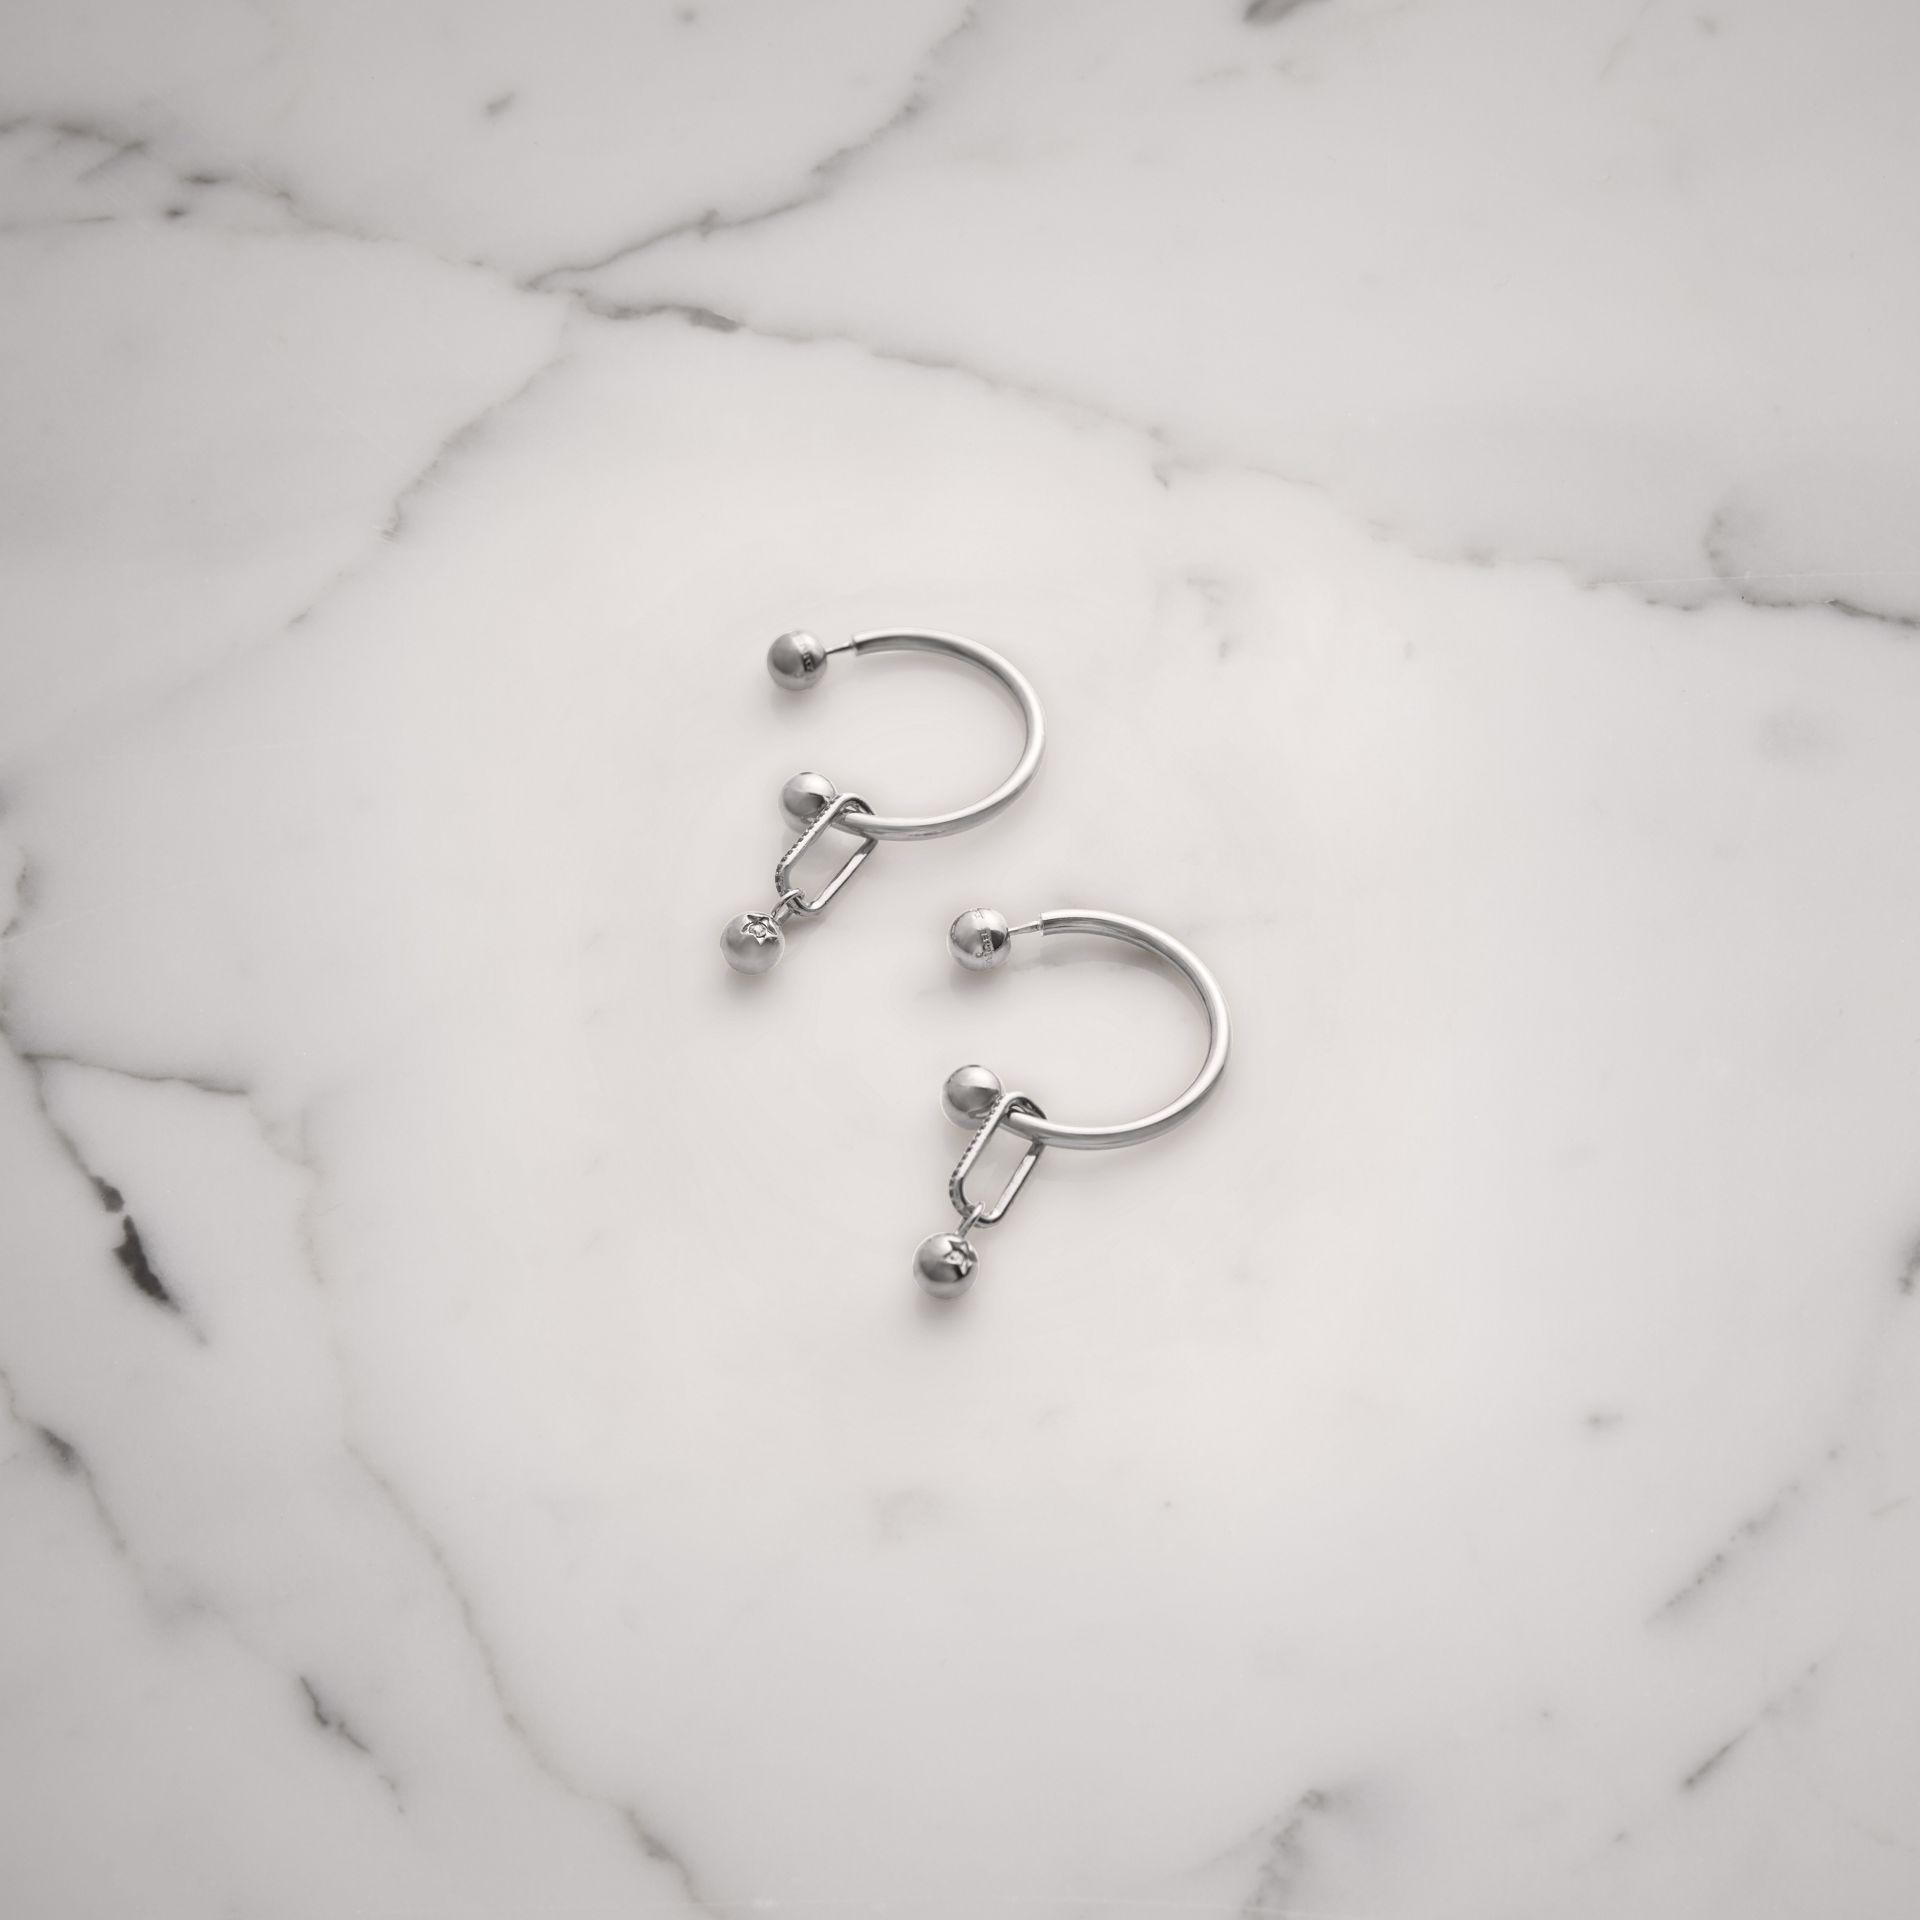 Burberry Crystal Charm Palladium-plated Hoop Earrings - Metallic Pv5bho0GV